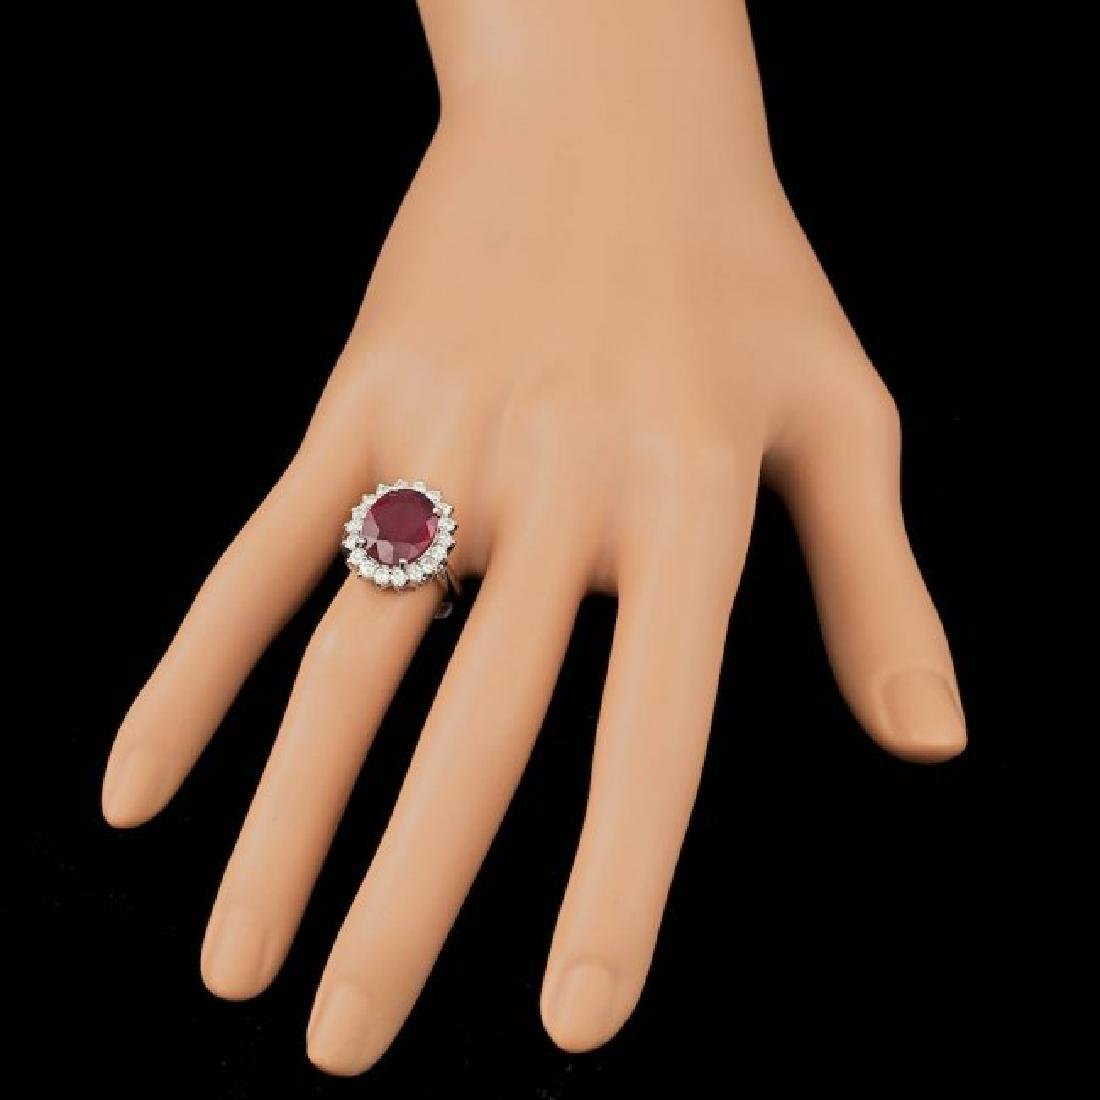 14k White Gold 5.00ct Ruby 0.85ct Diamond Ring - 4